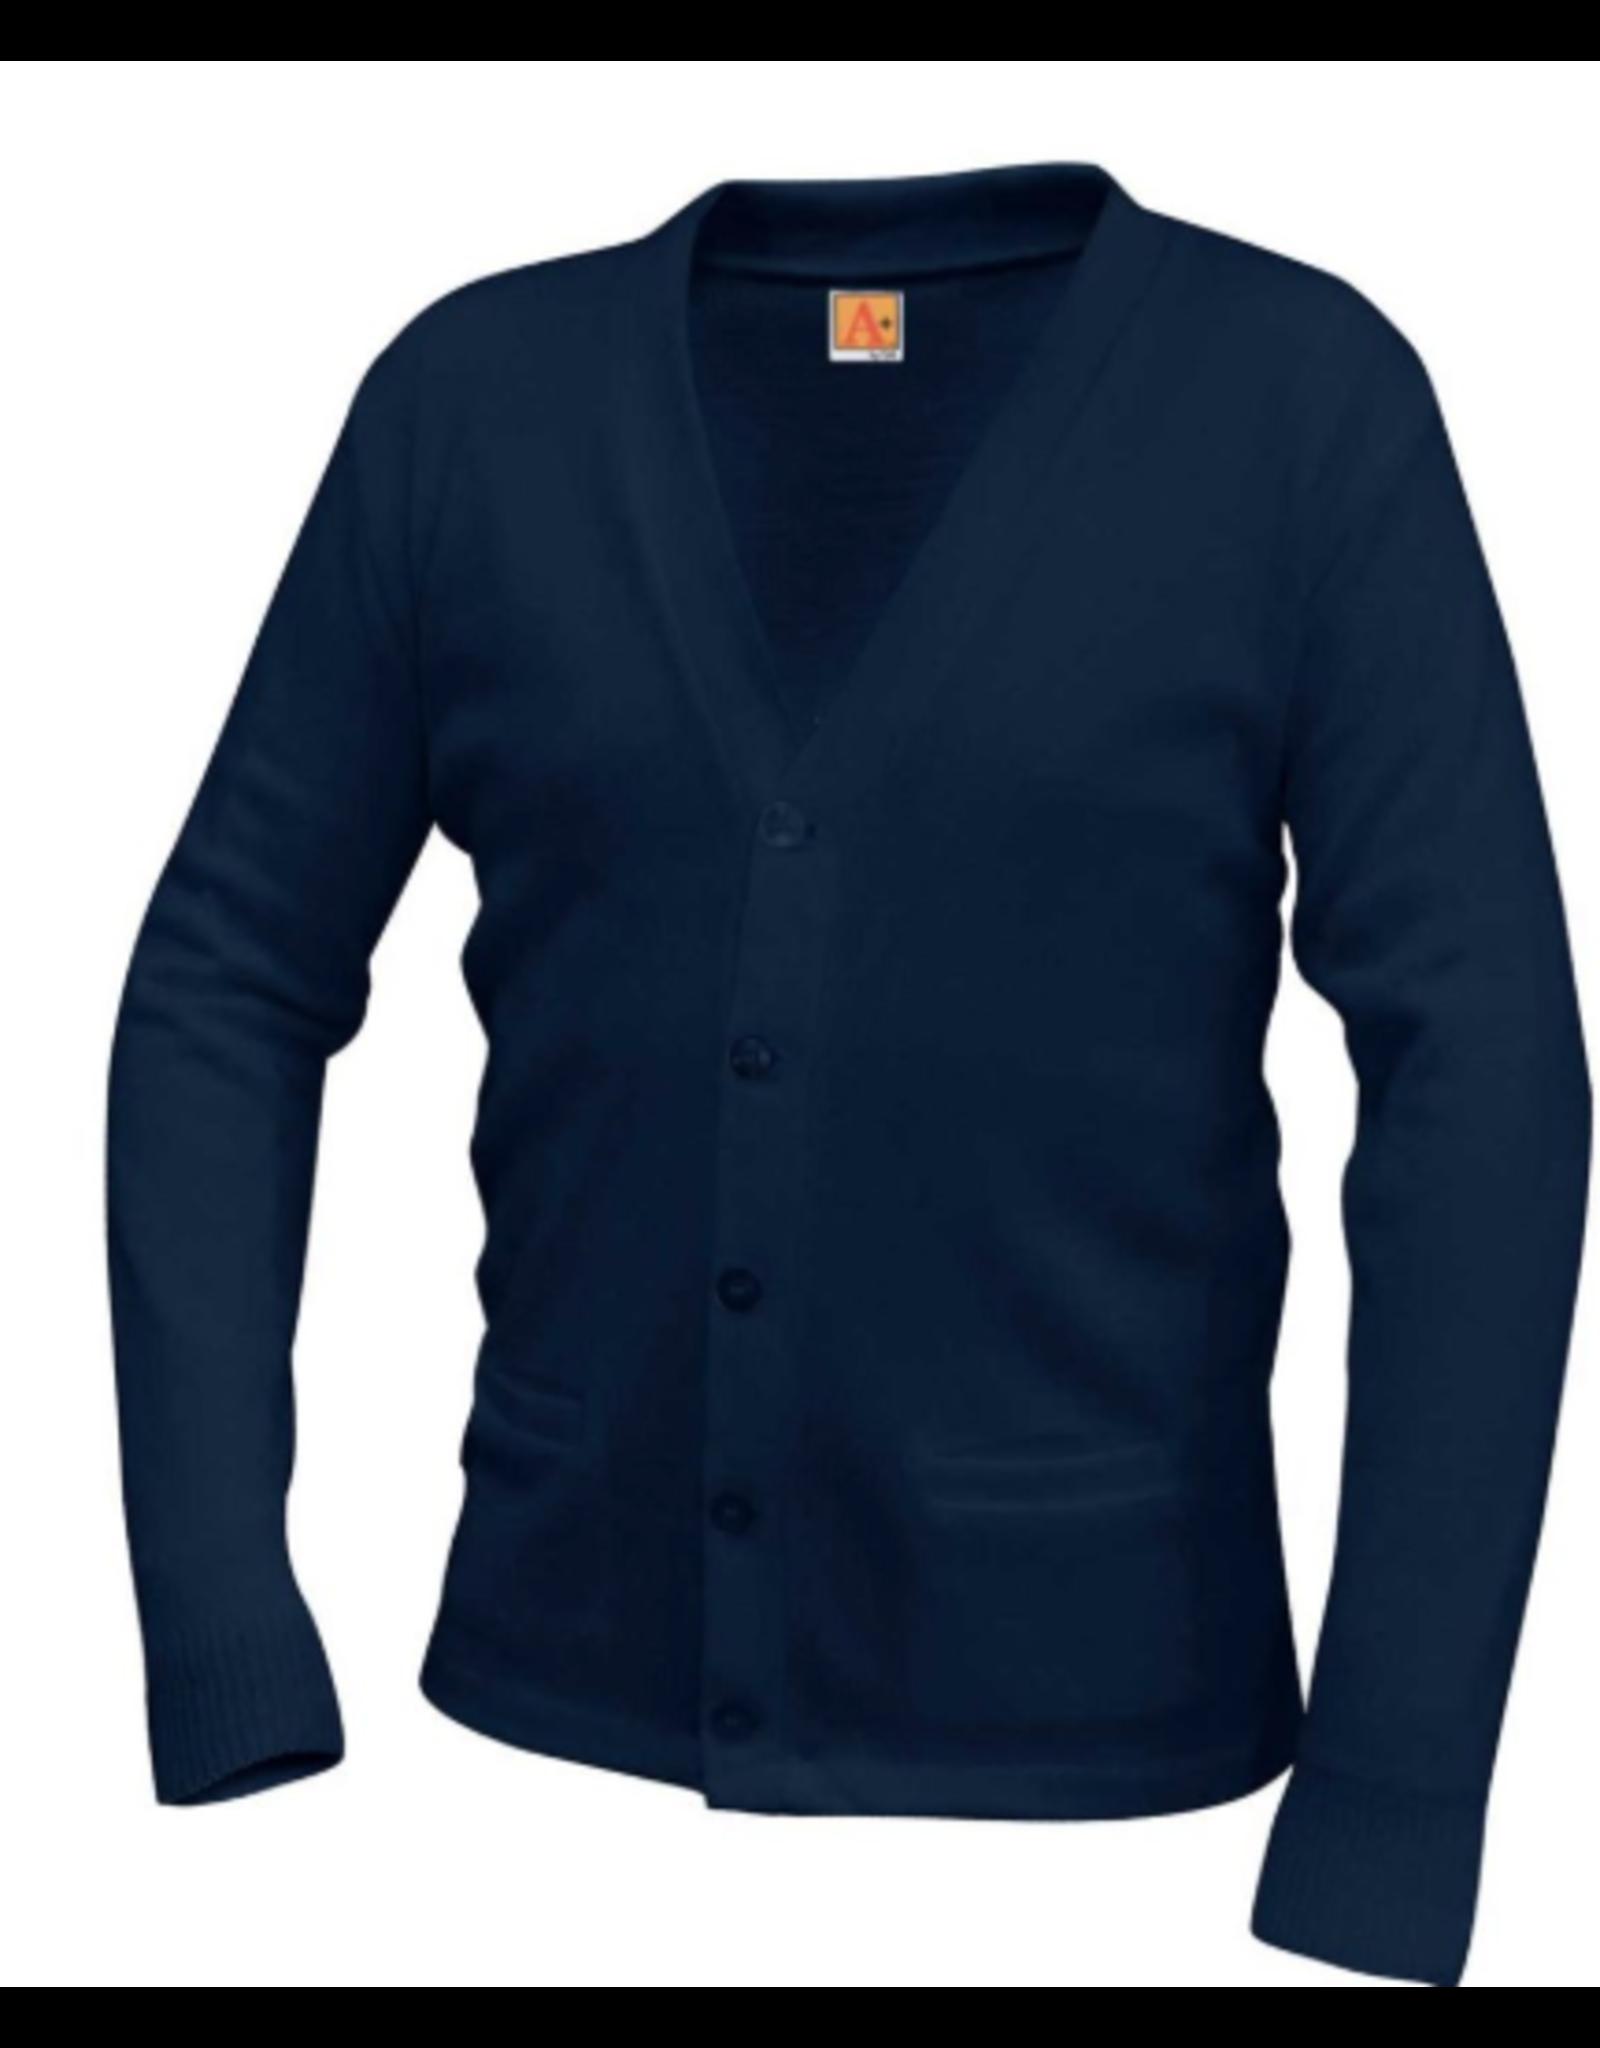 UNIFORM JD SilverLine Cardigan Sweater